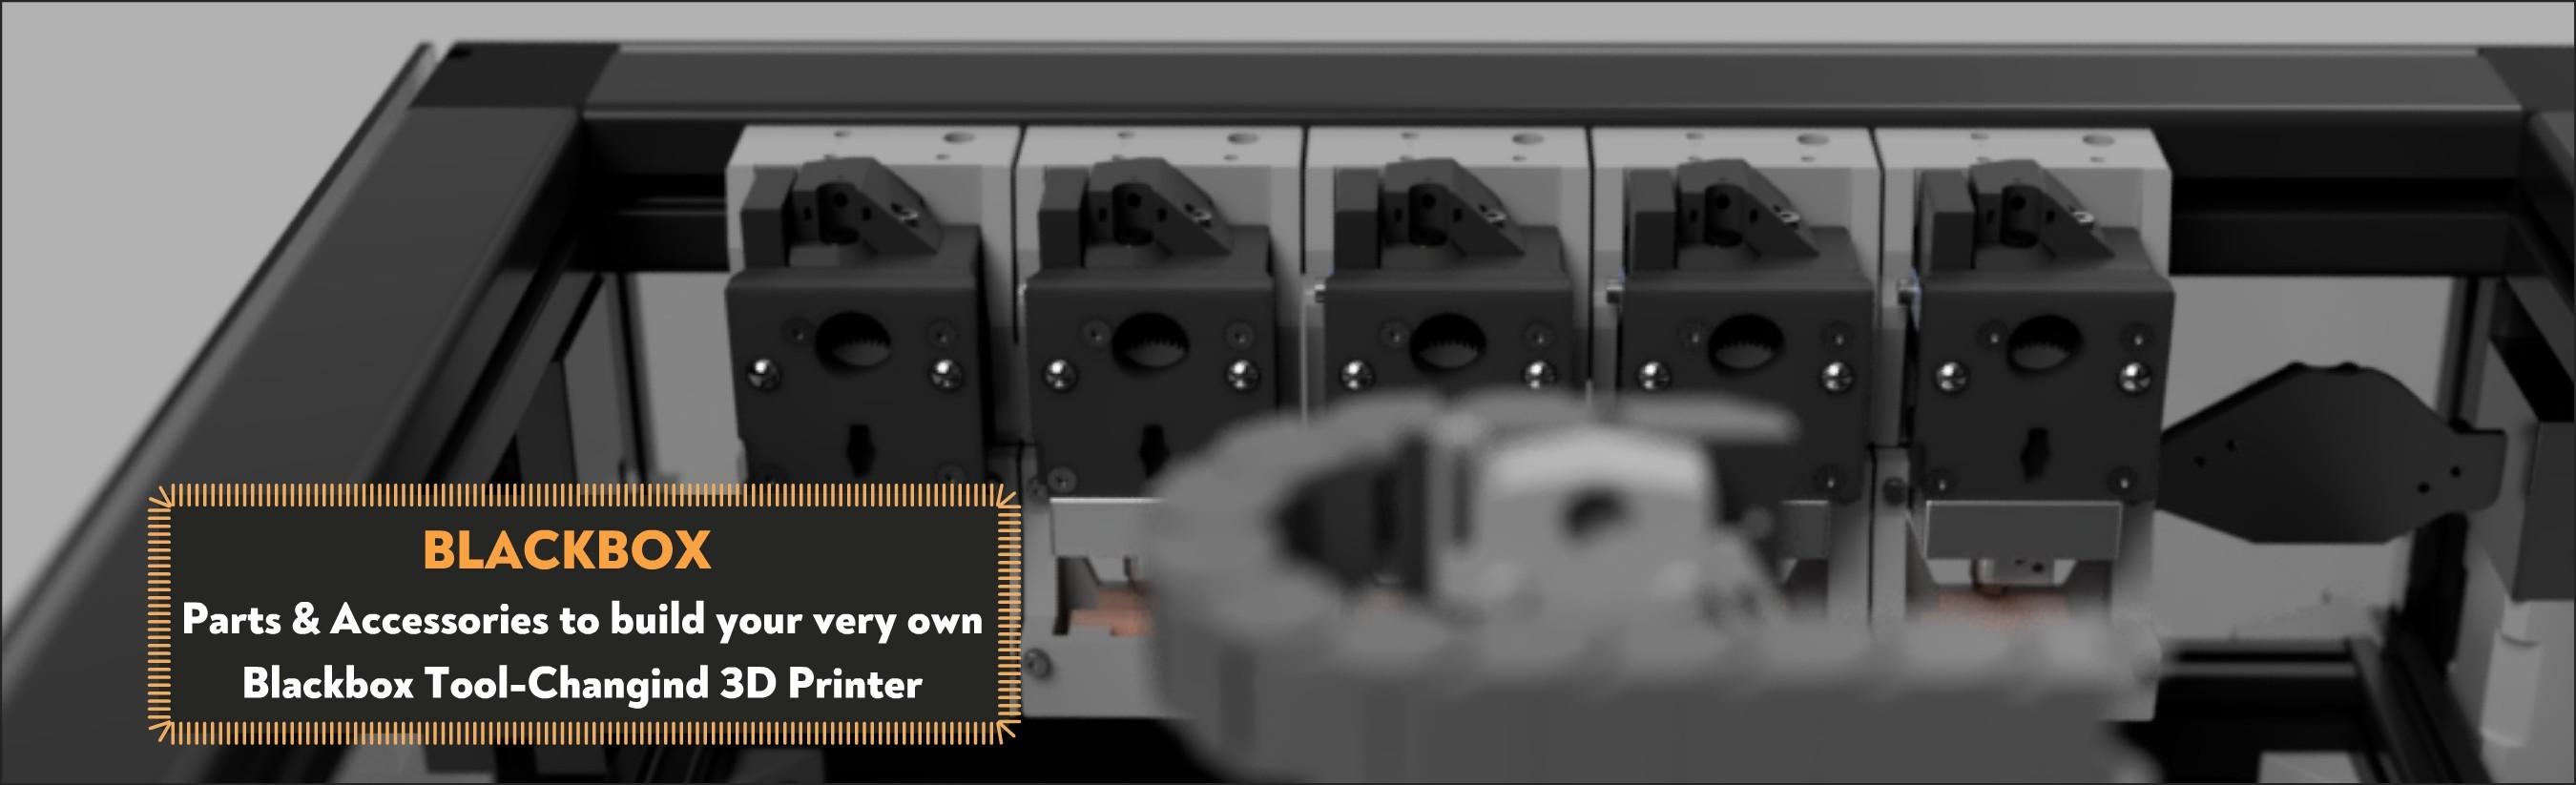 Blackbox Parts + Accessories